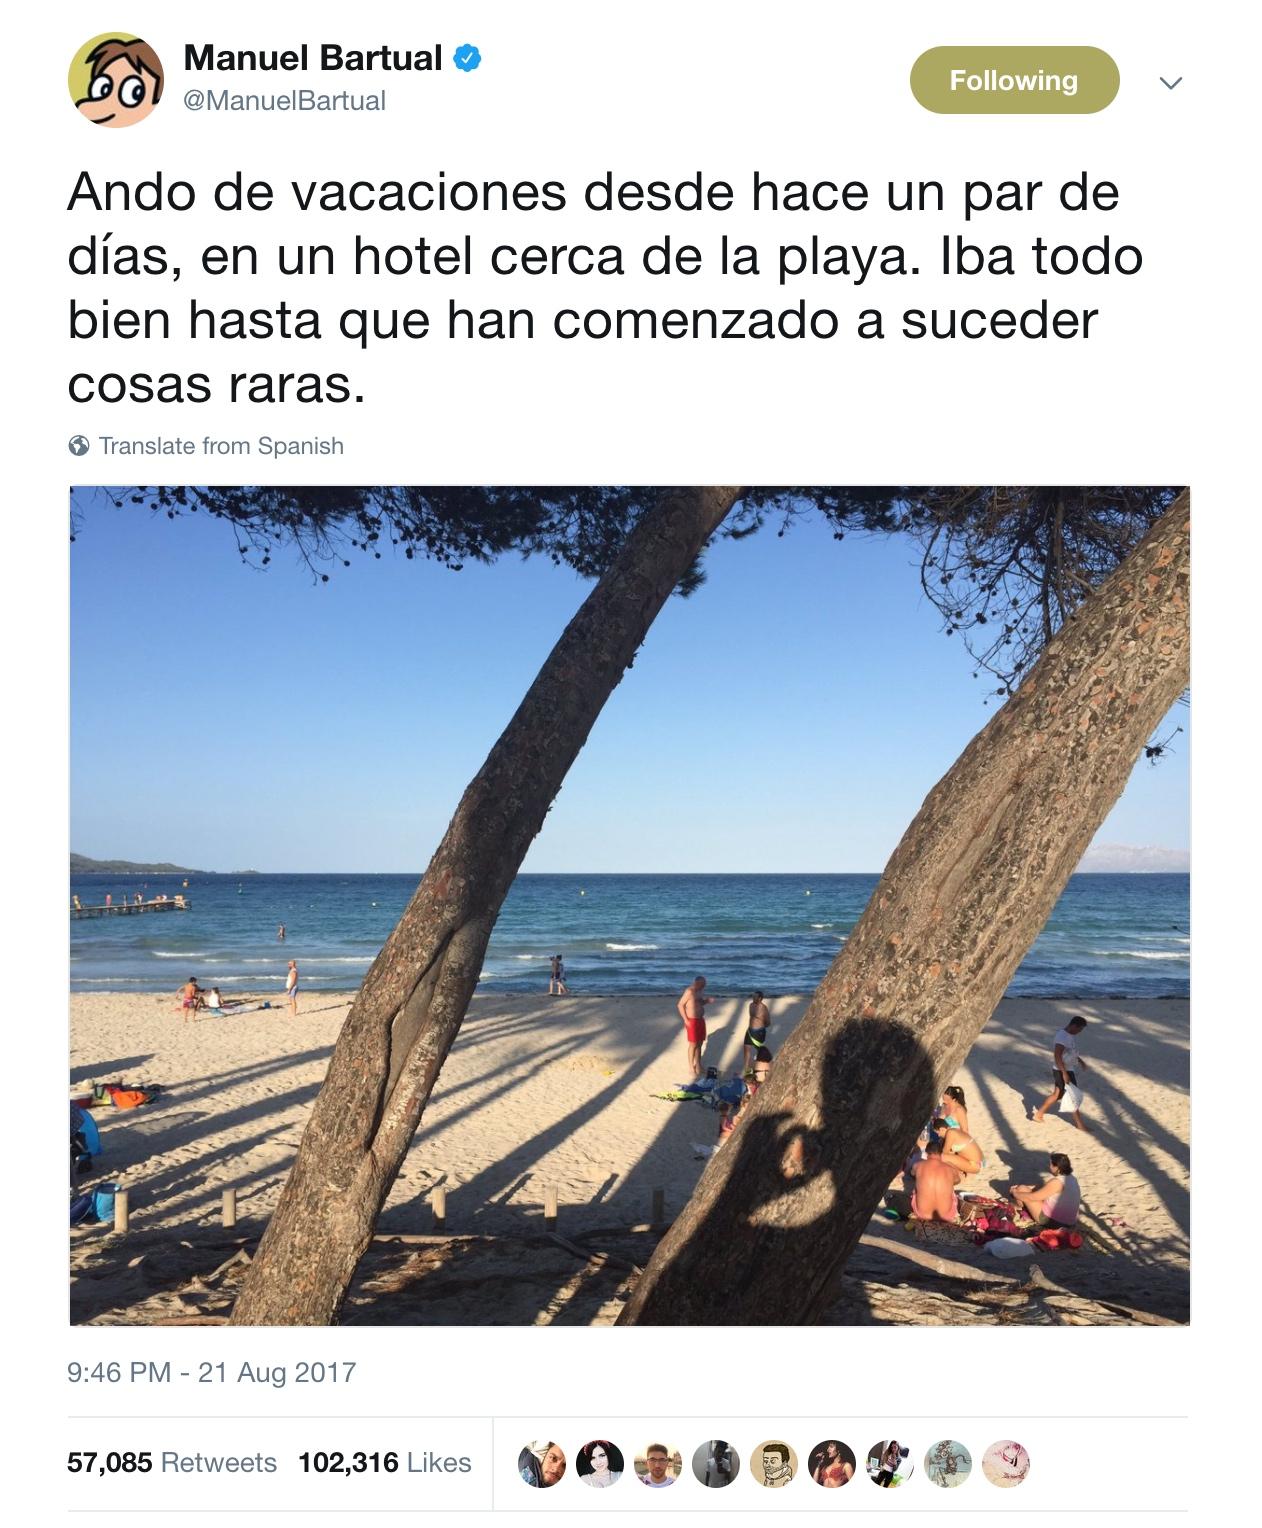 Manuel Bartual, la twitternovela y la viralidad